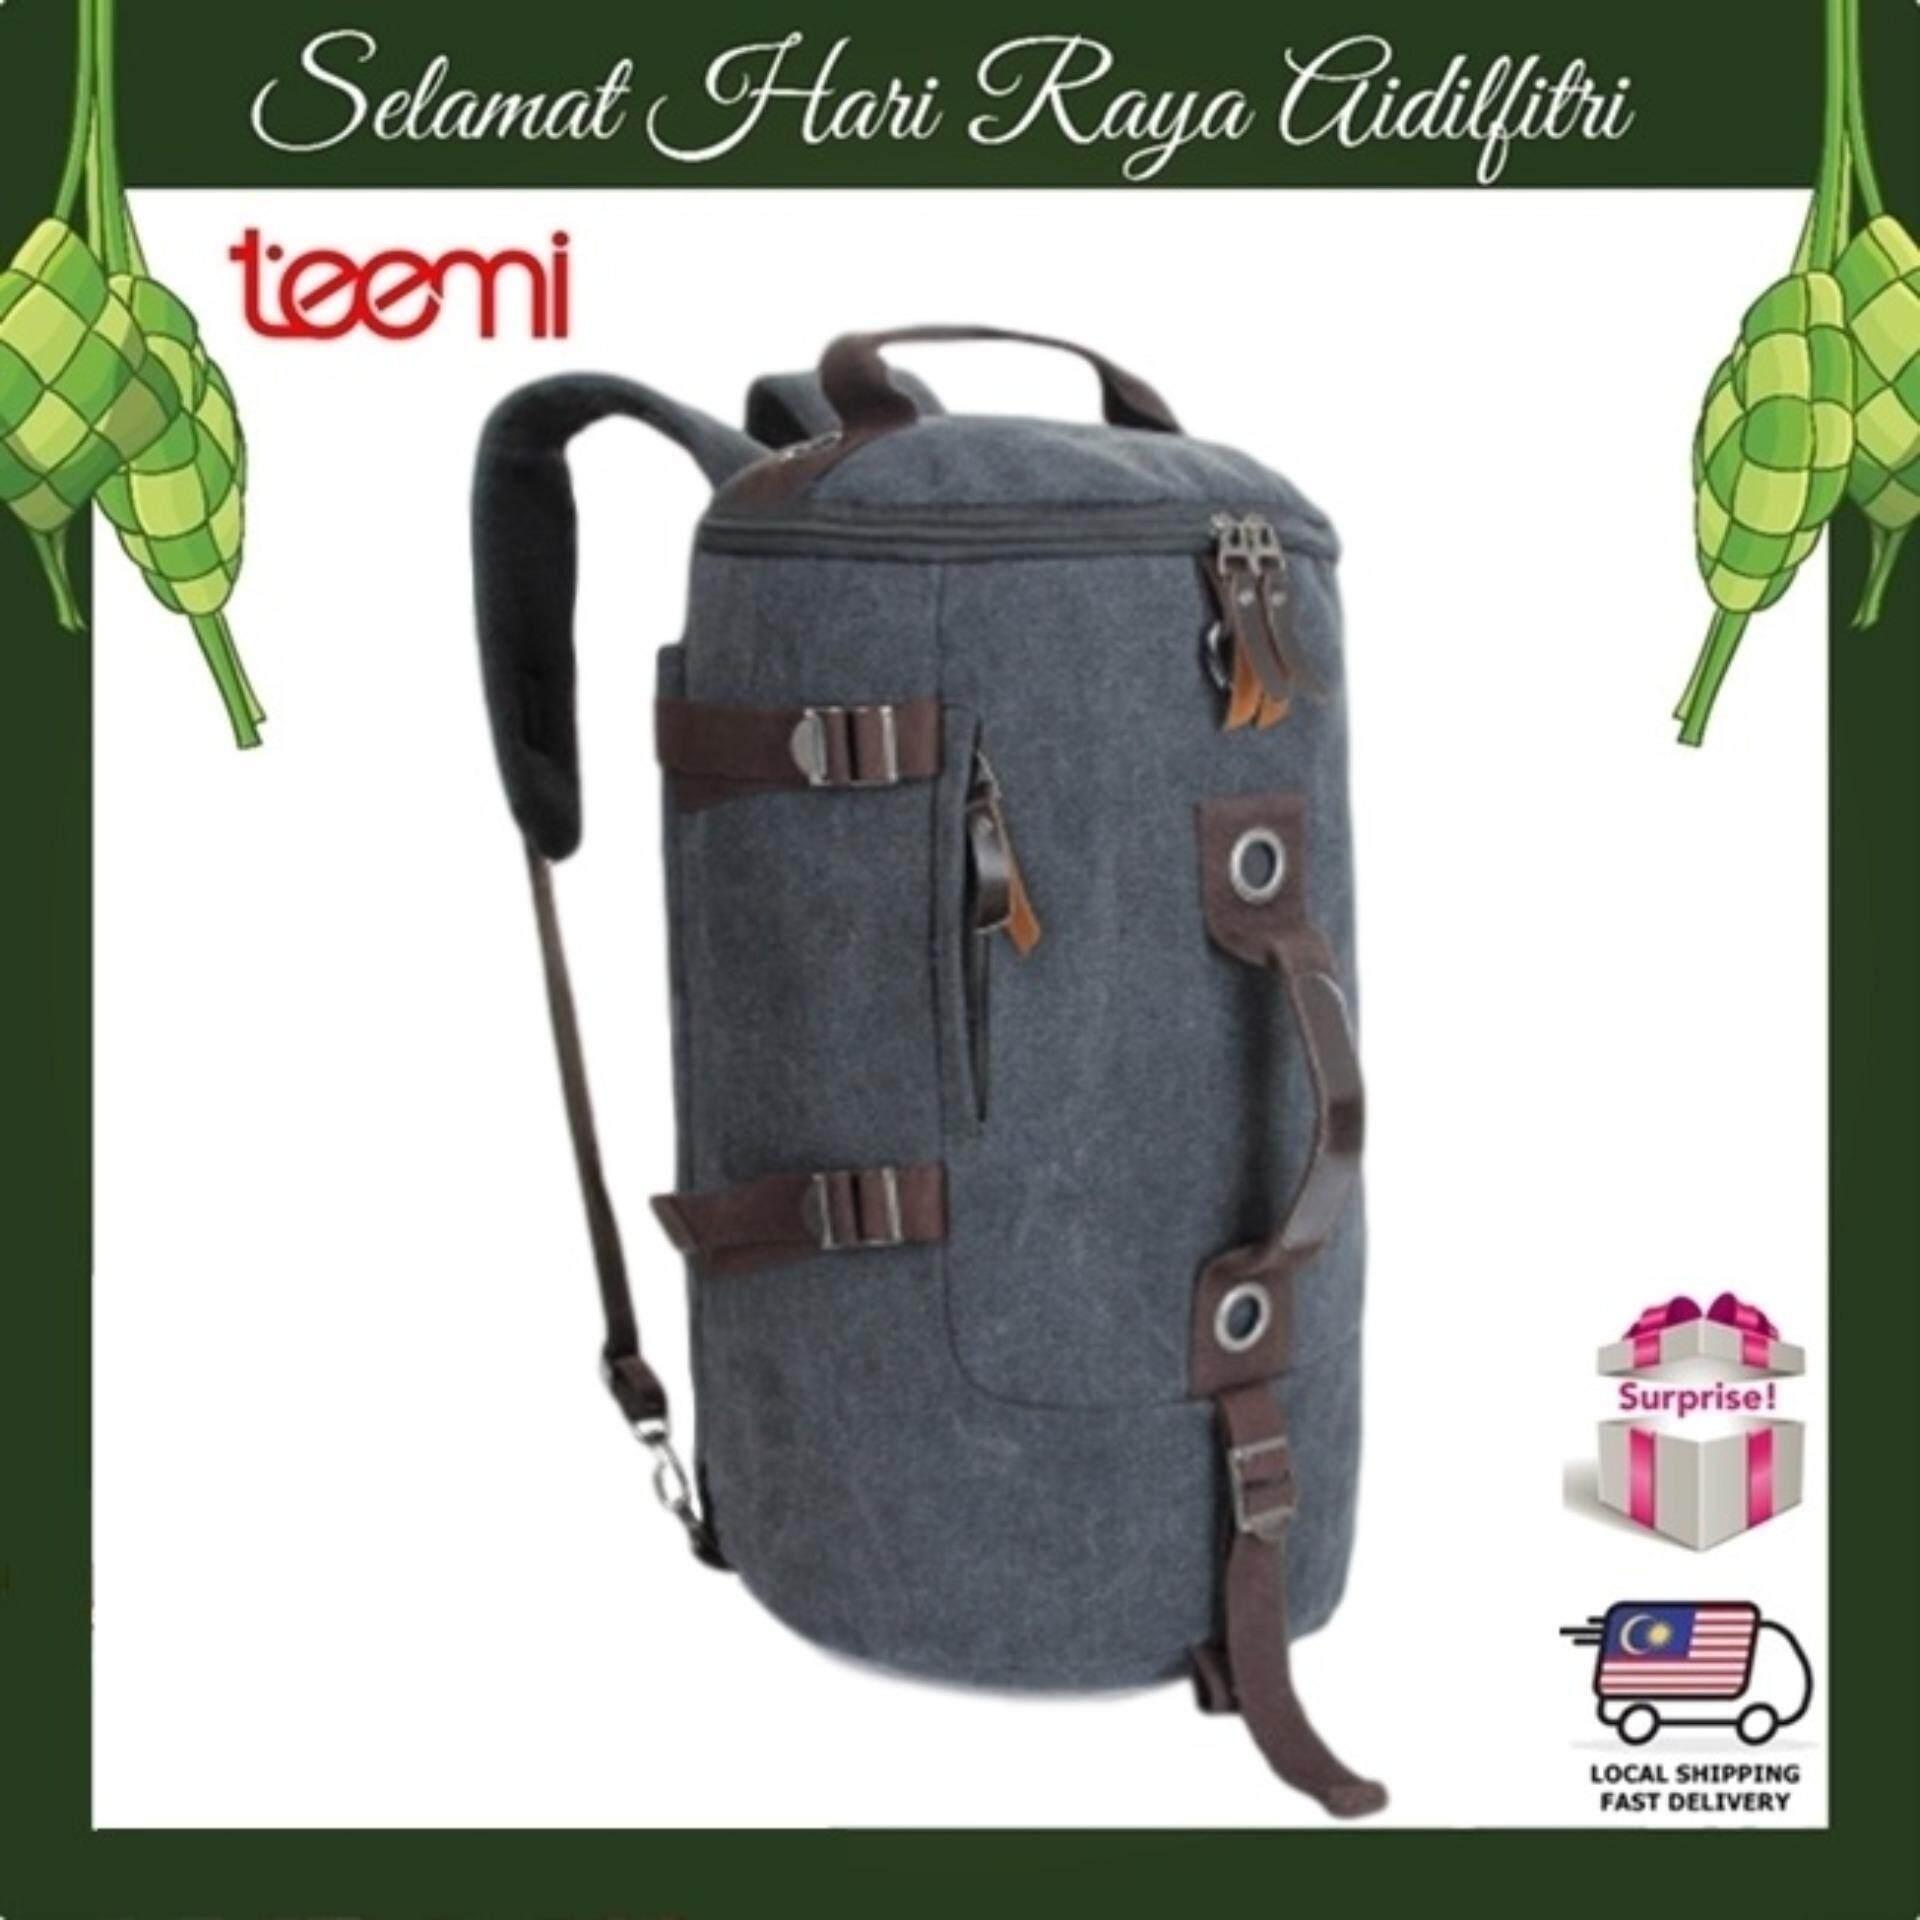 TEEMI Duffel Bag Convertible Hiking Backpack Multipurpose 3 in 1 Travel Luggage Duffle Canvas Day Pack - Black